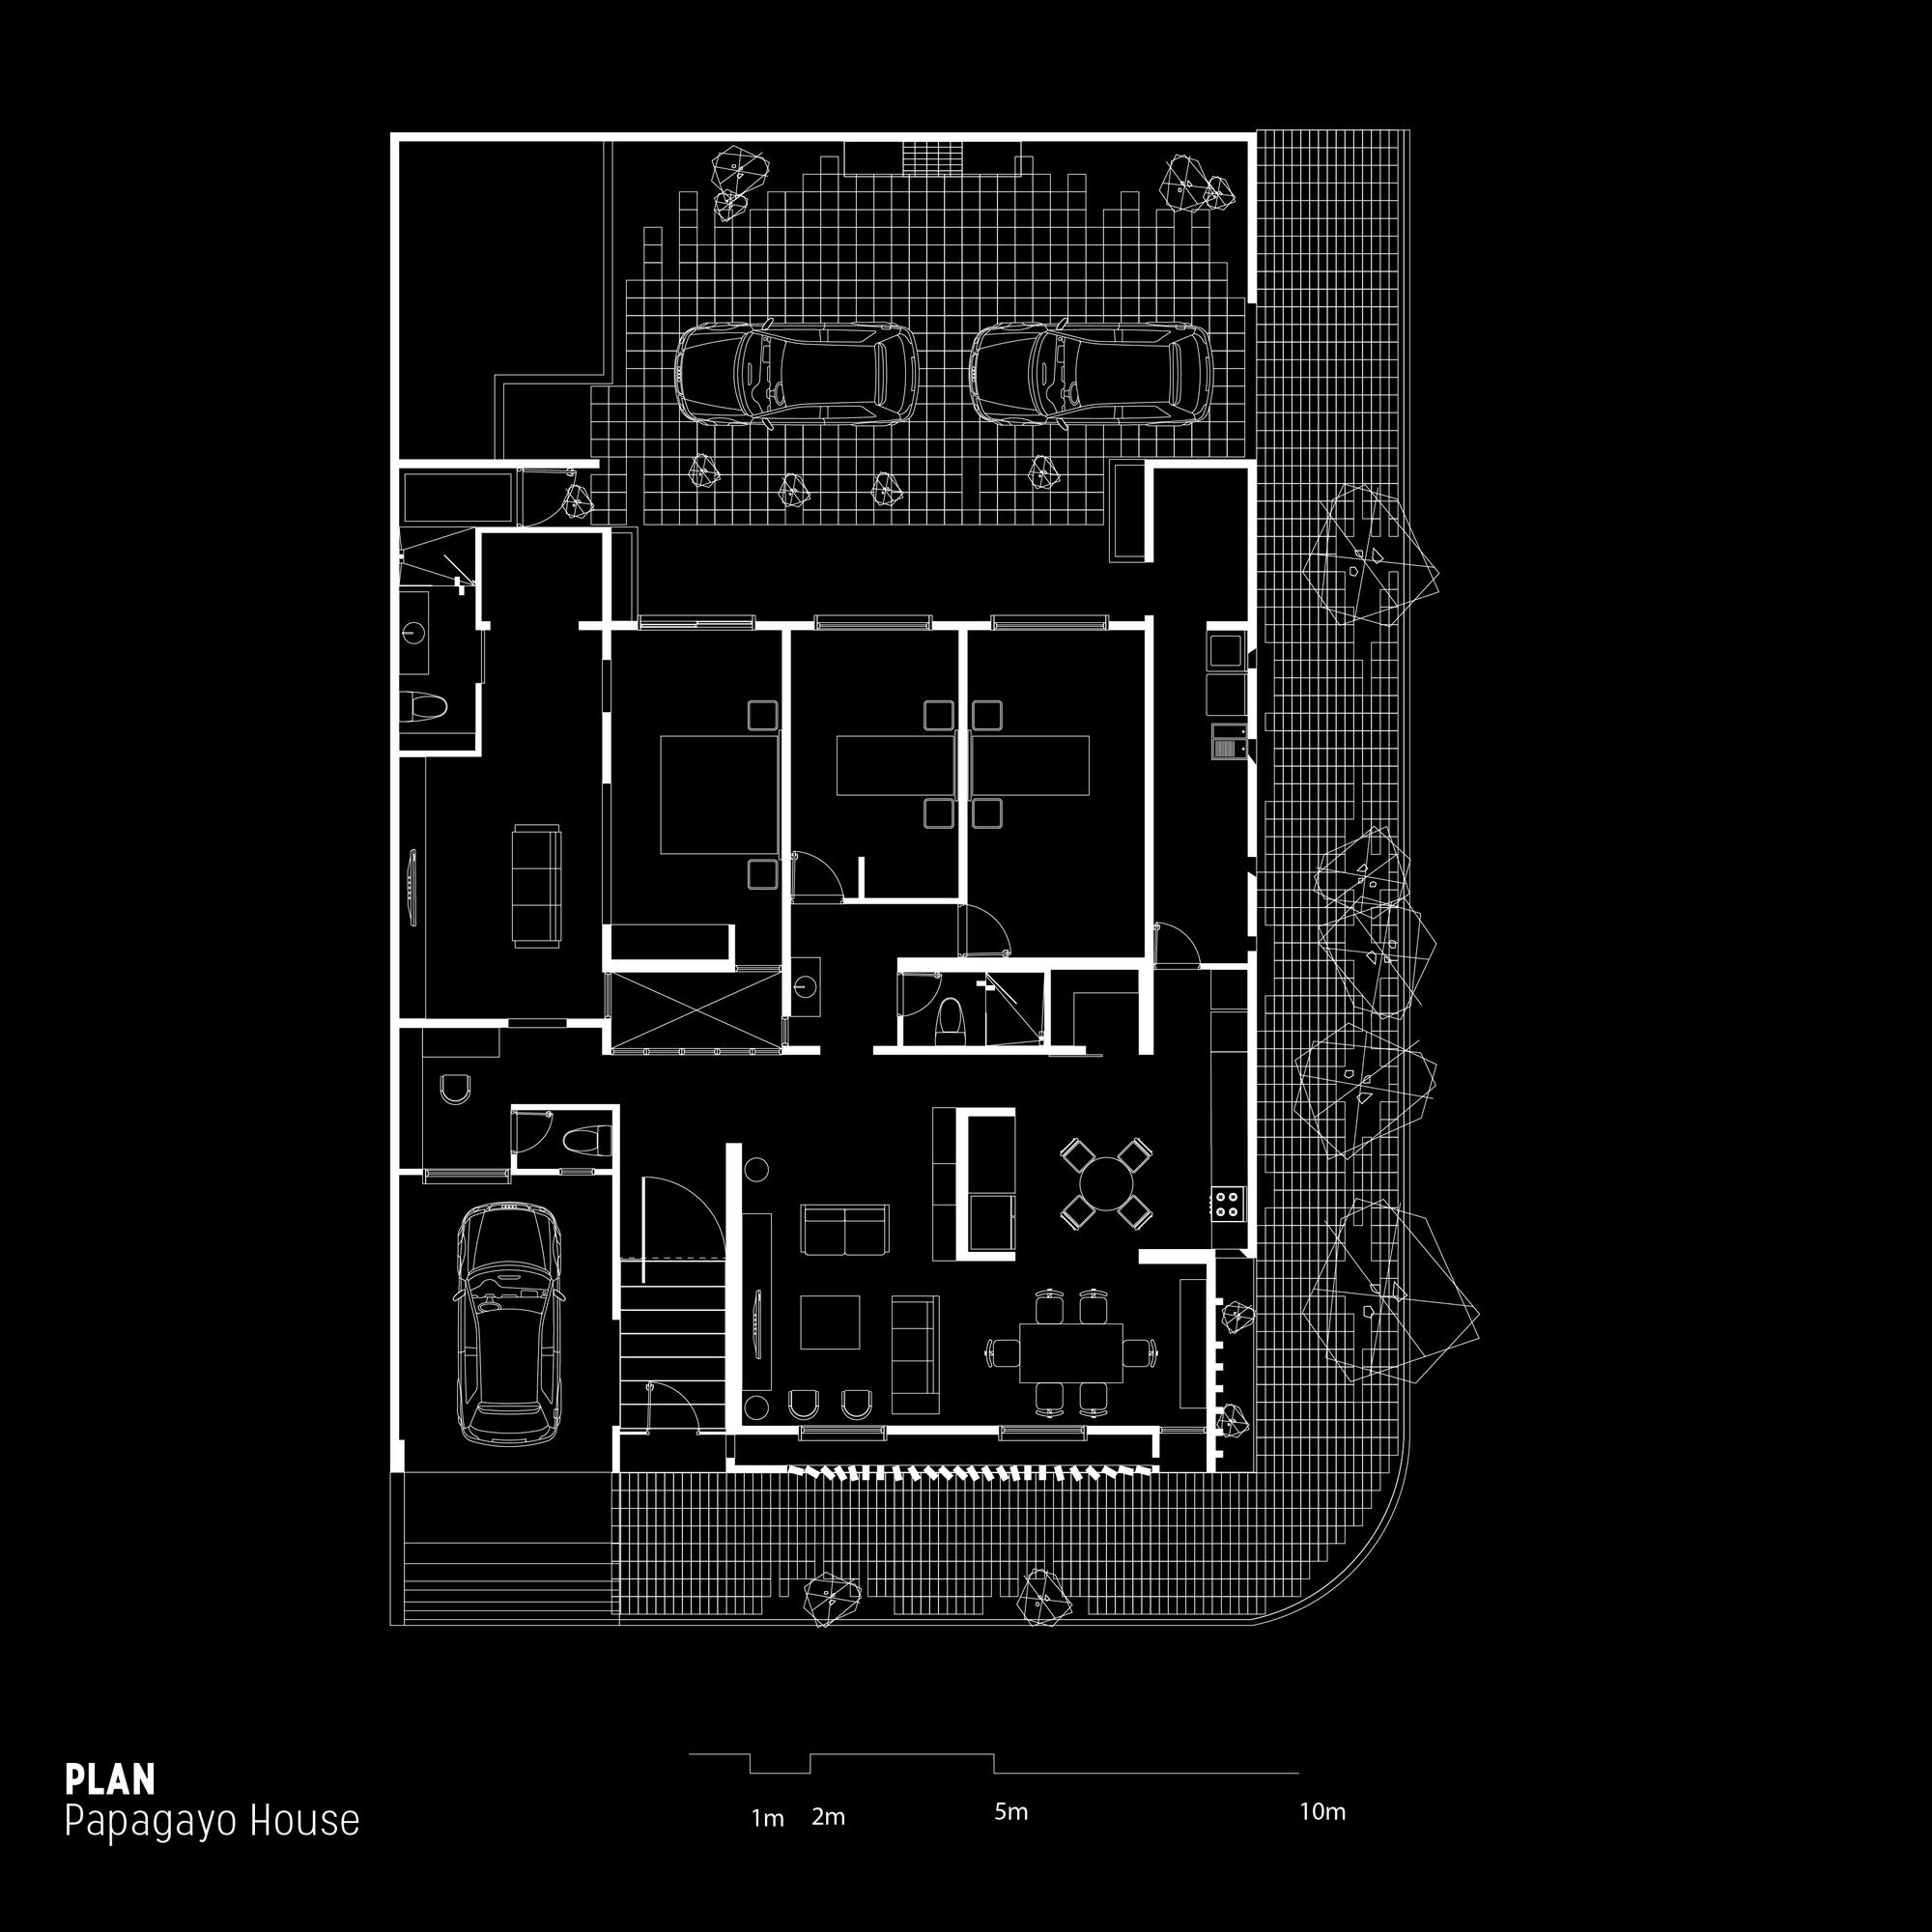 Gallery of Papao House / Ariel Valenzuela + Diego Ledesma - 33 on christmas story house floor plan, frodo baggins house floor plan, incredibles house floor plan, gatsby house floor plan, barbie house floor plan,